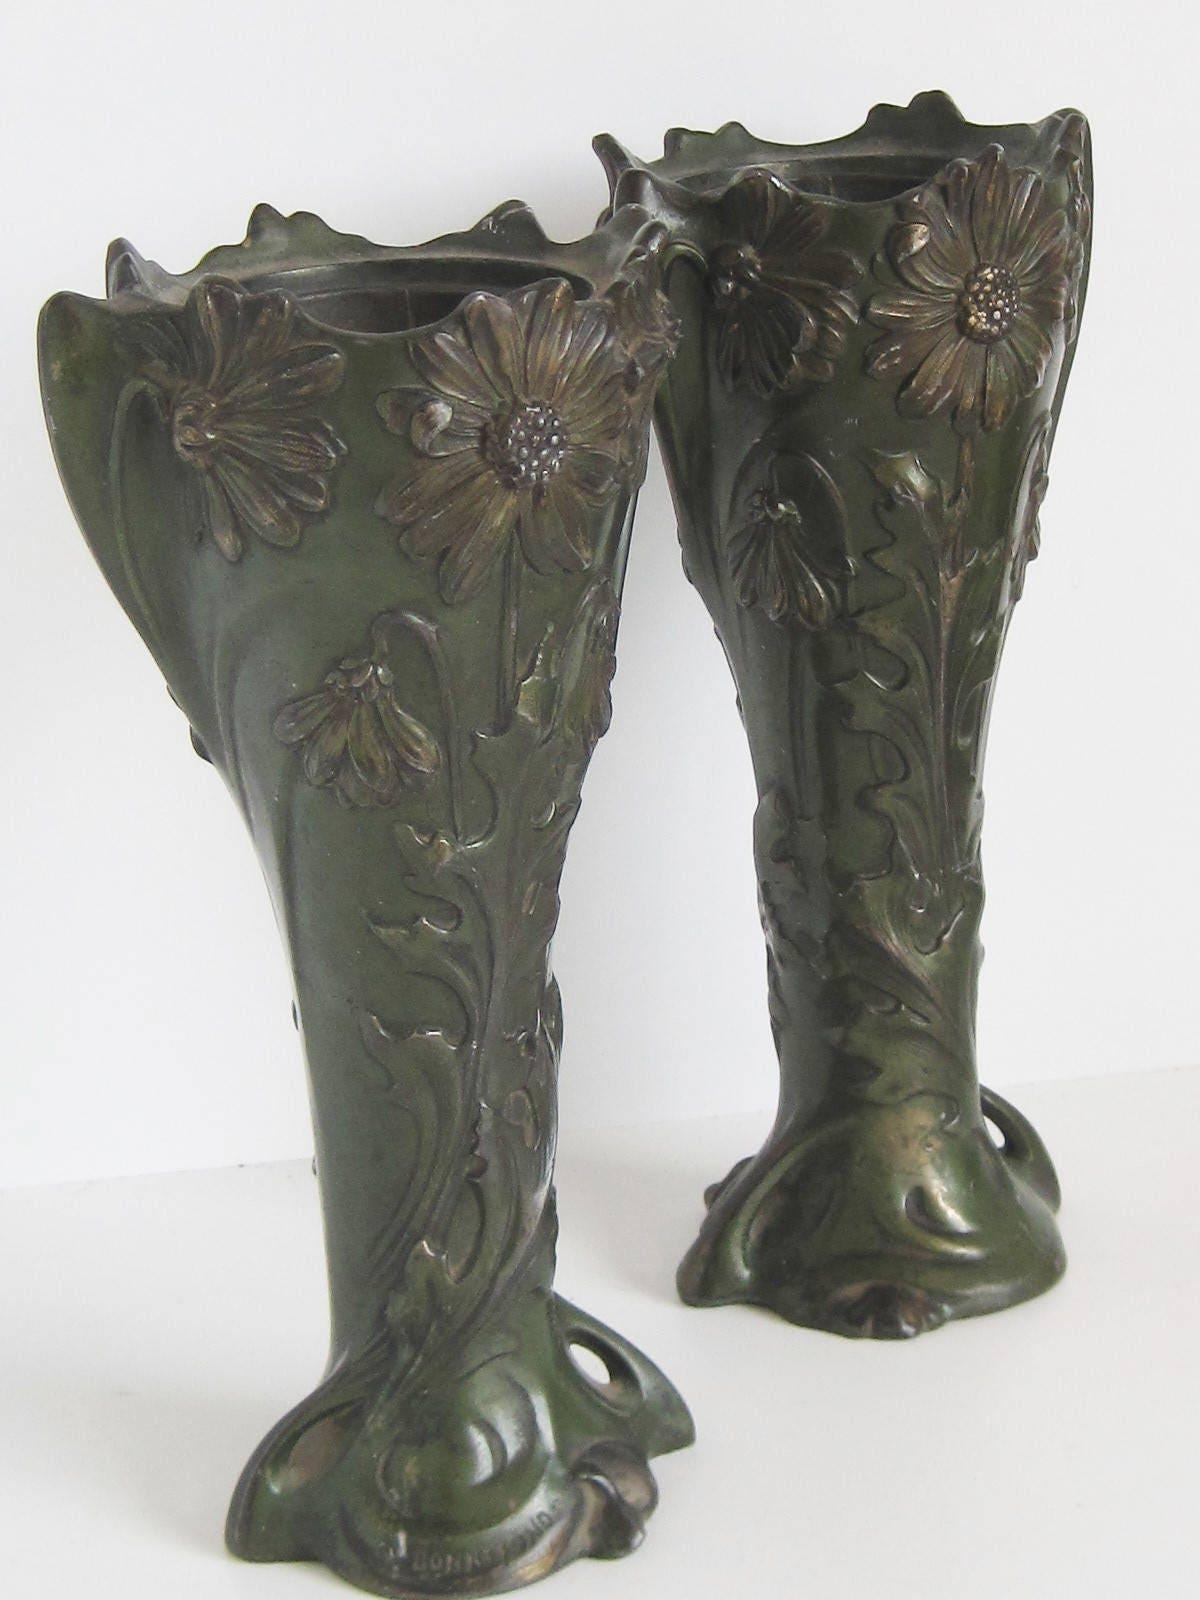 Bonnefond france pair french bronze art nouveau vases late bonnefond france pair french bronze art nouveau vases late 1800s early 1900s reviewsmspy